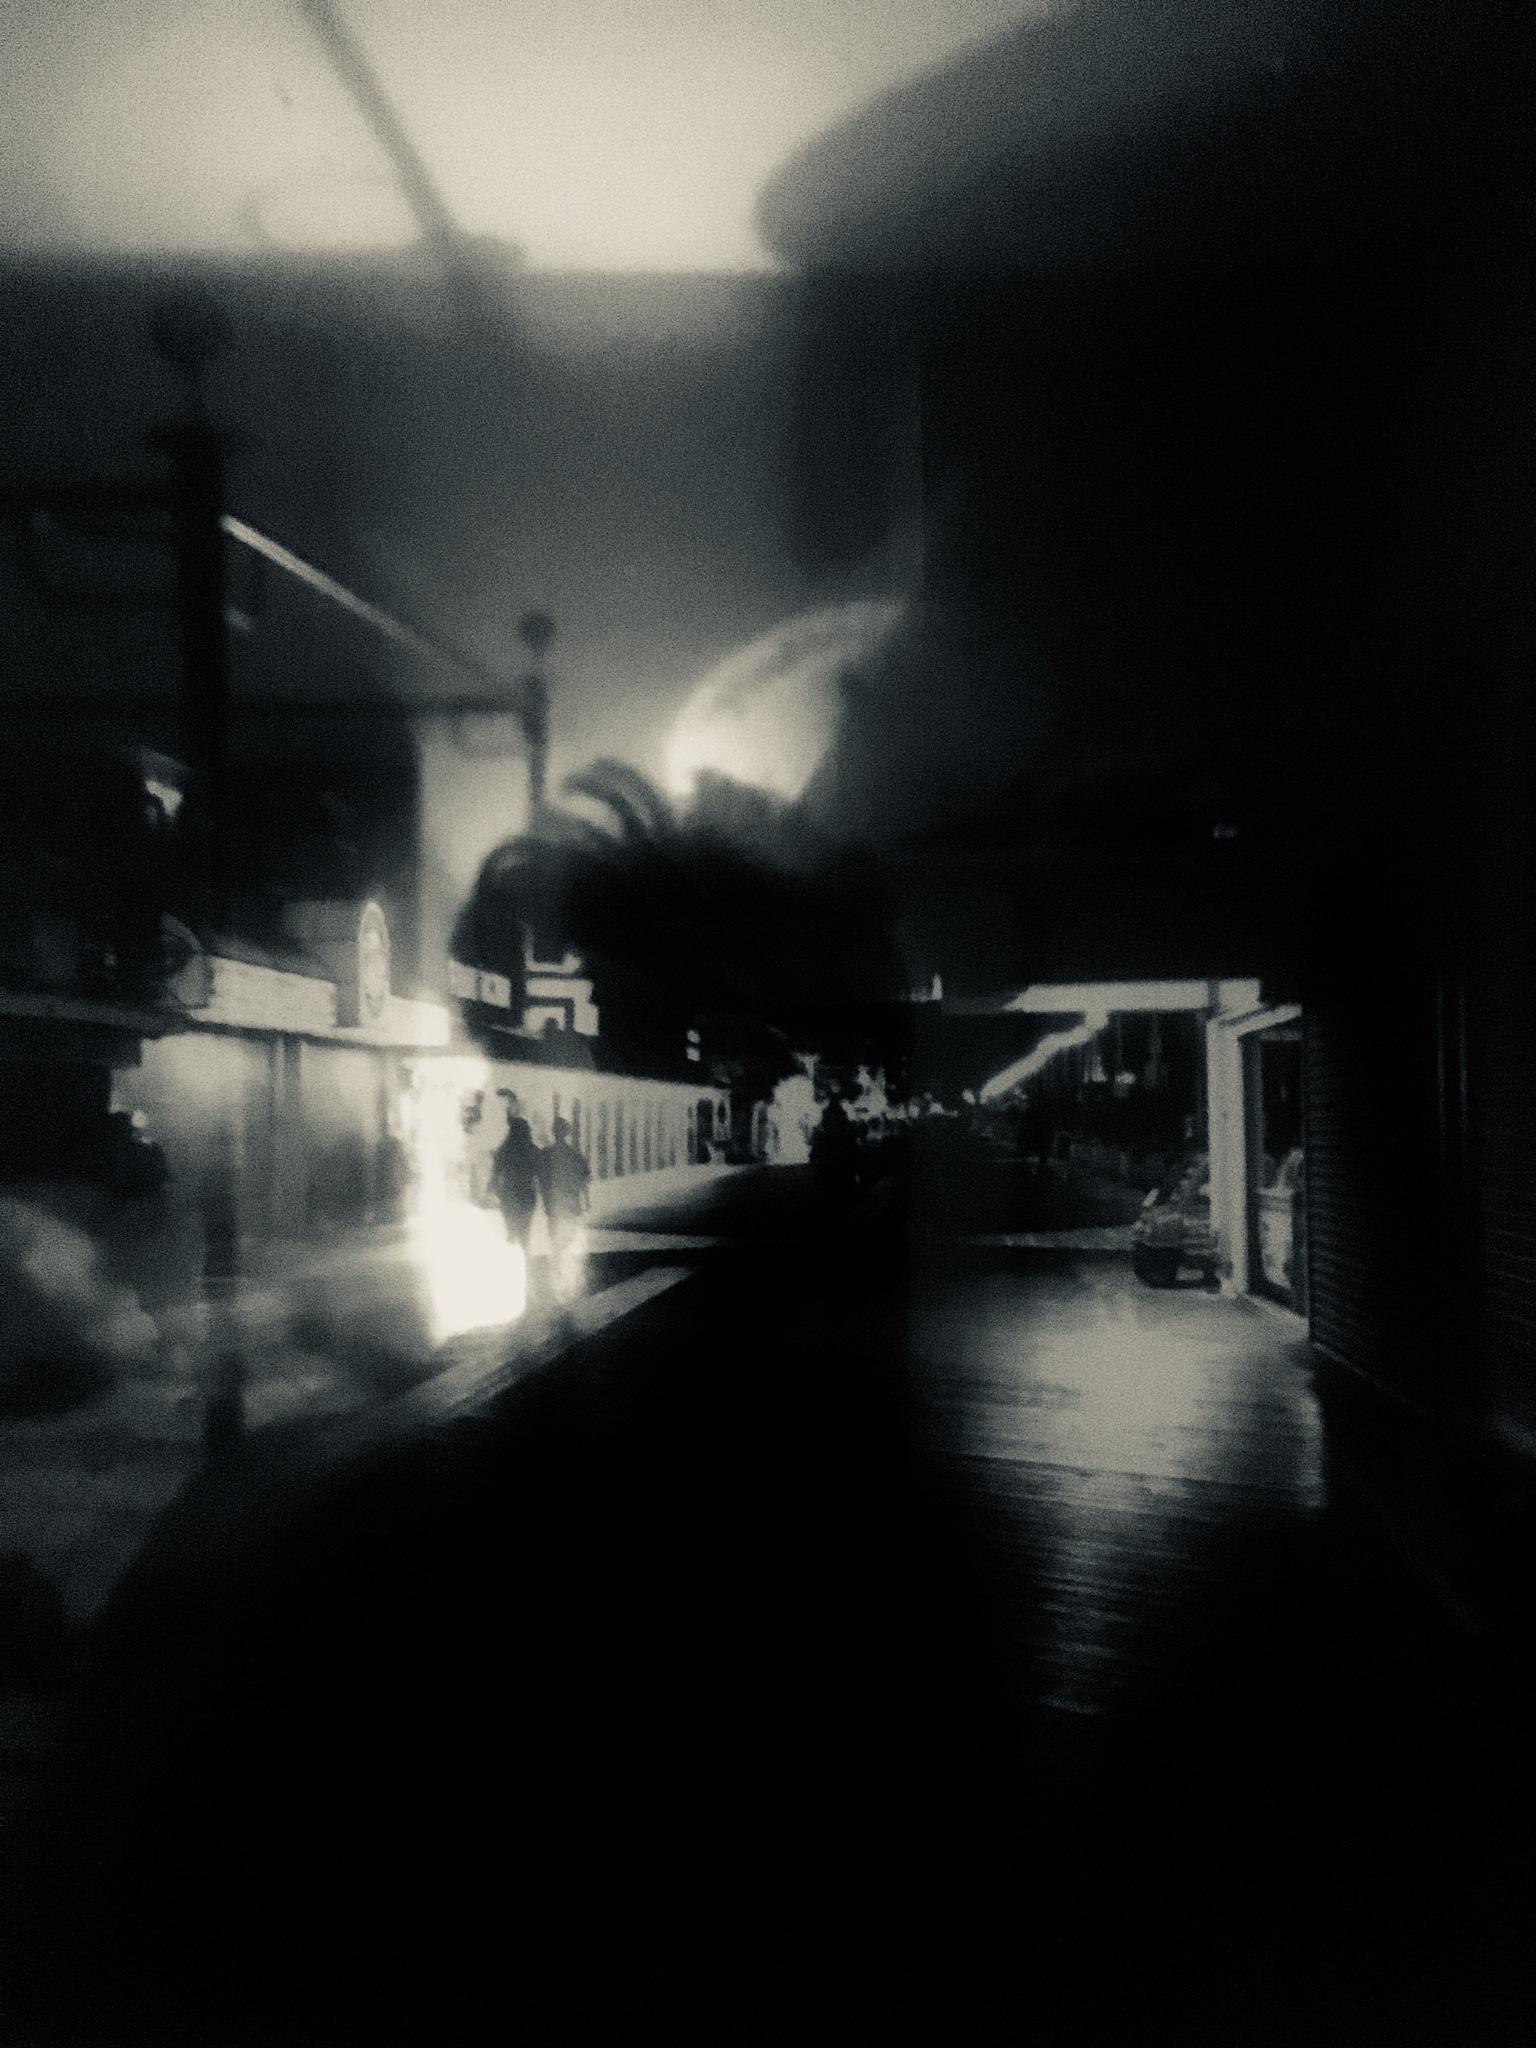 Untitled by glassworx2